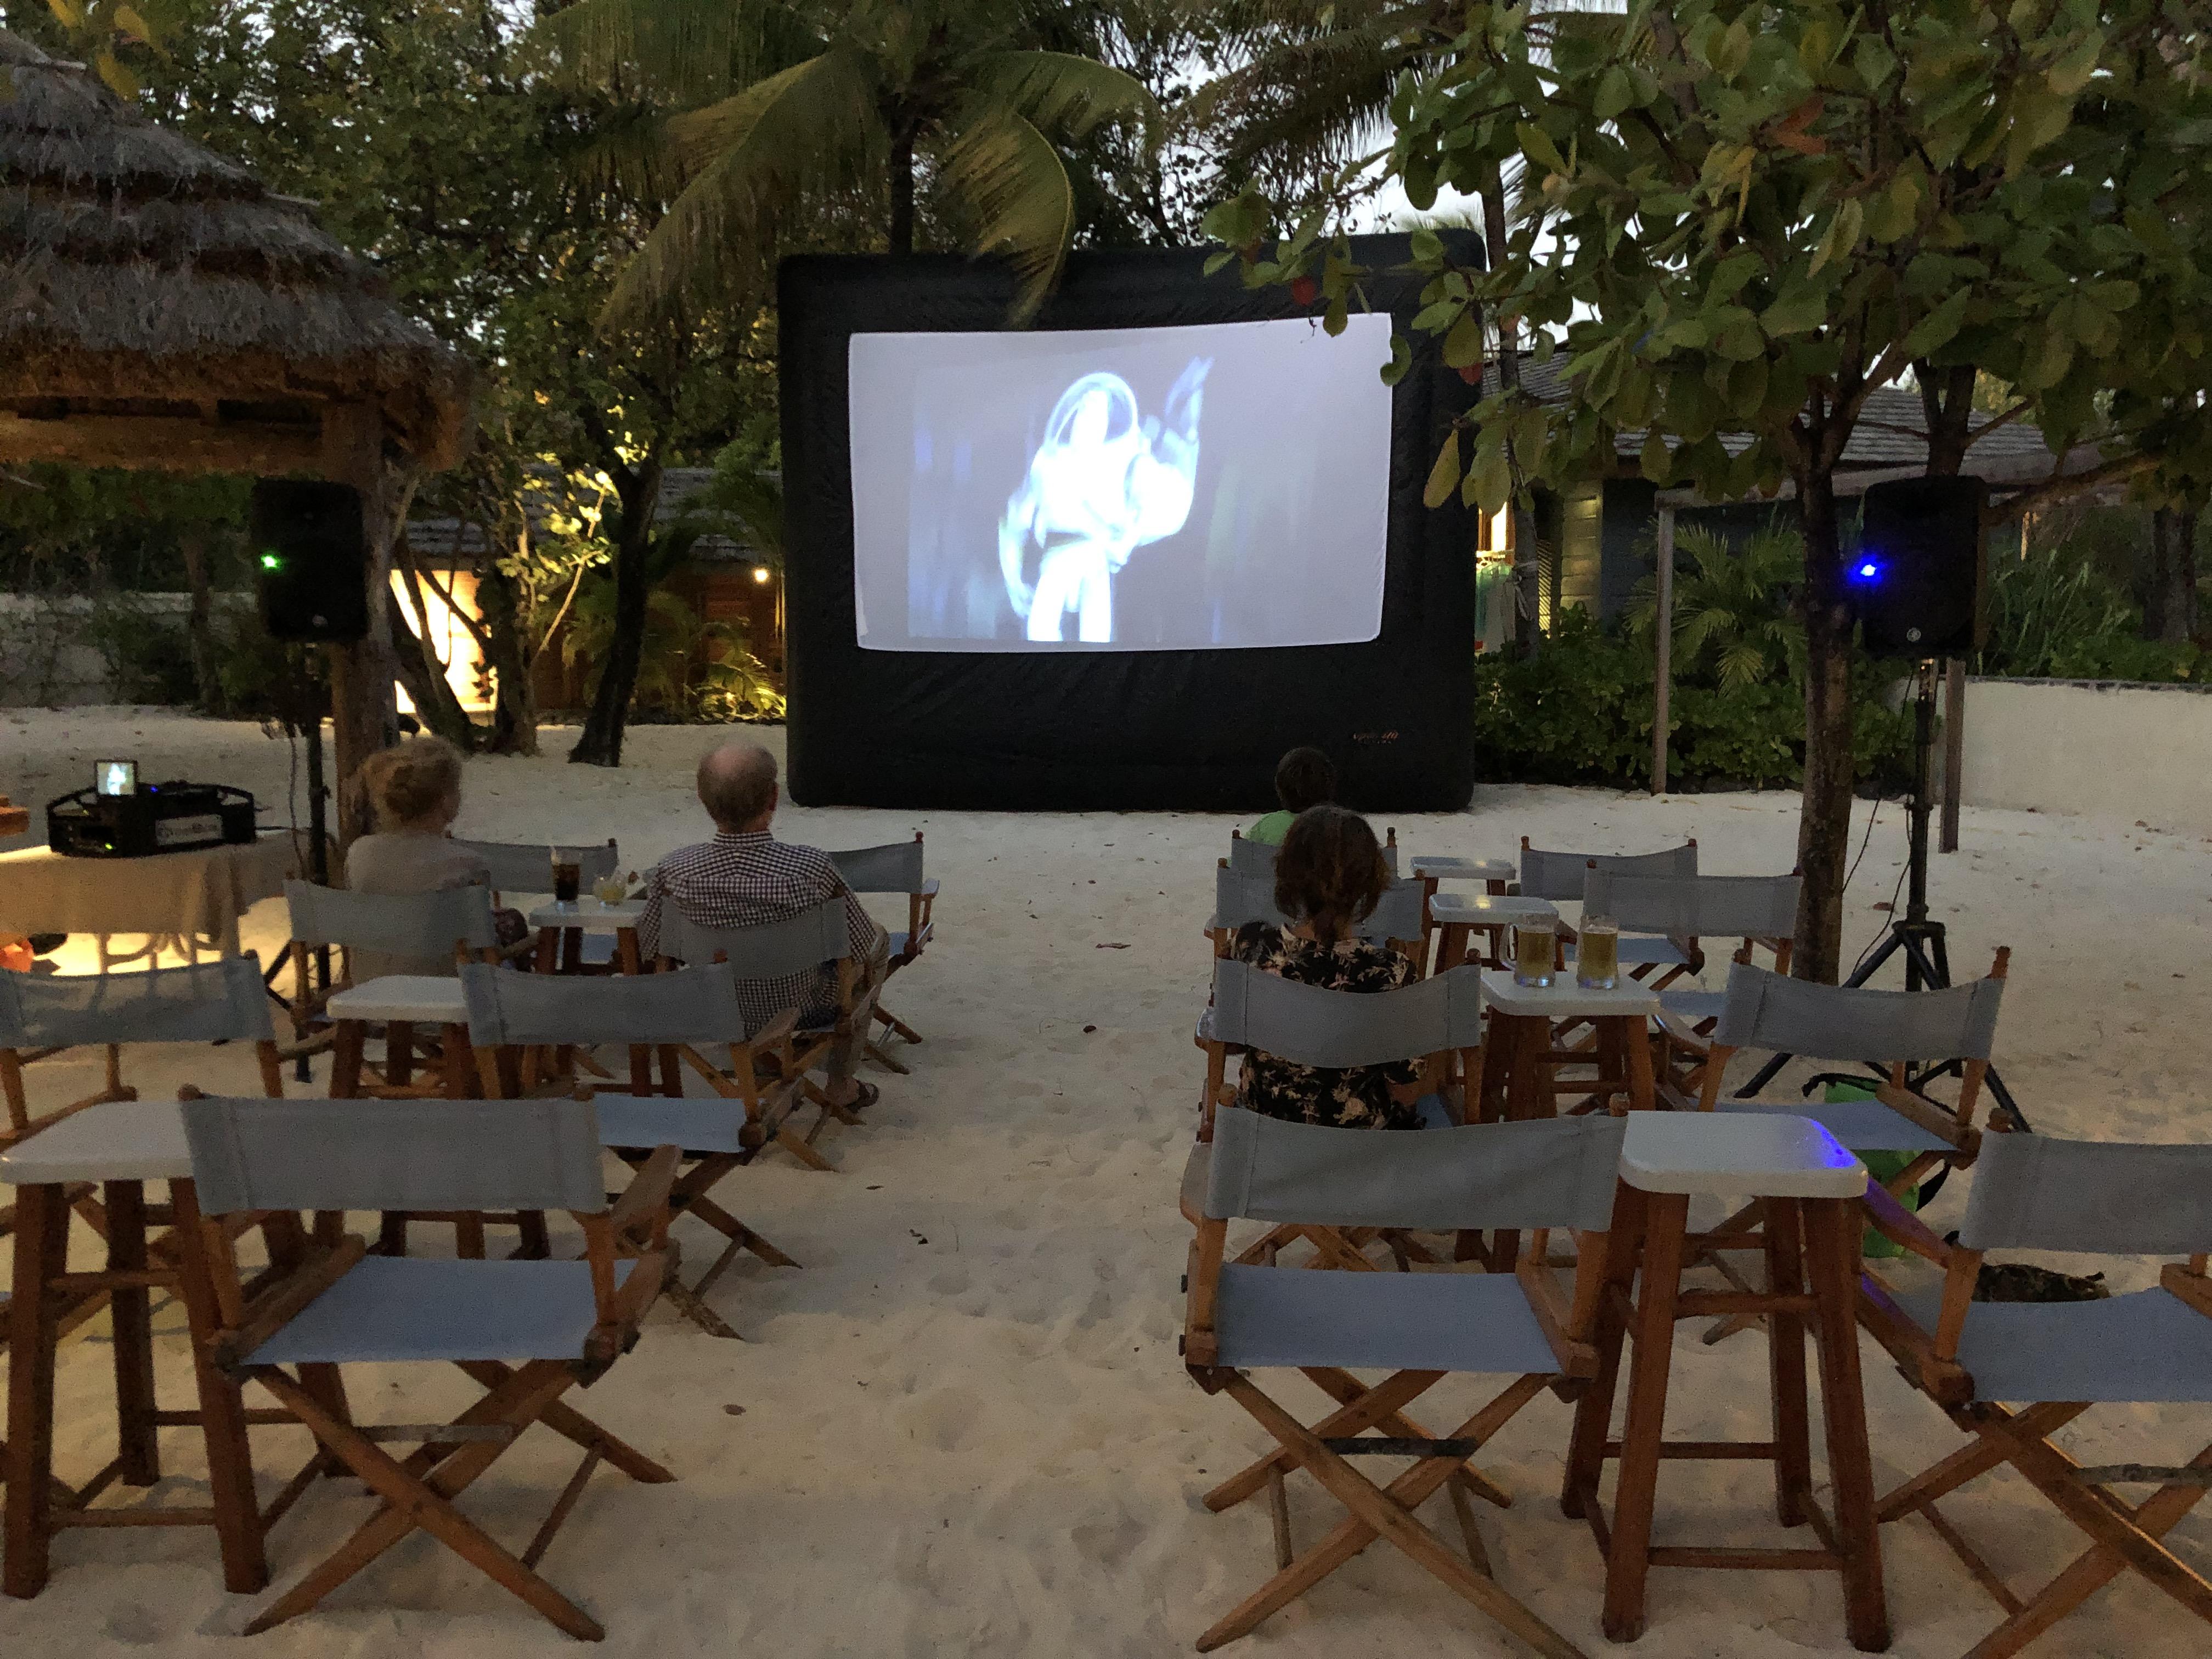 Beach Film Night at Goaties on PSV